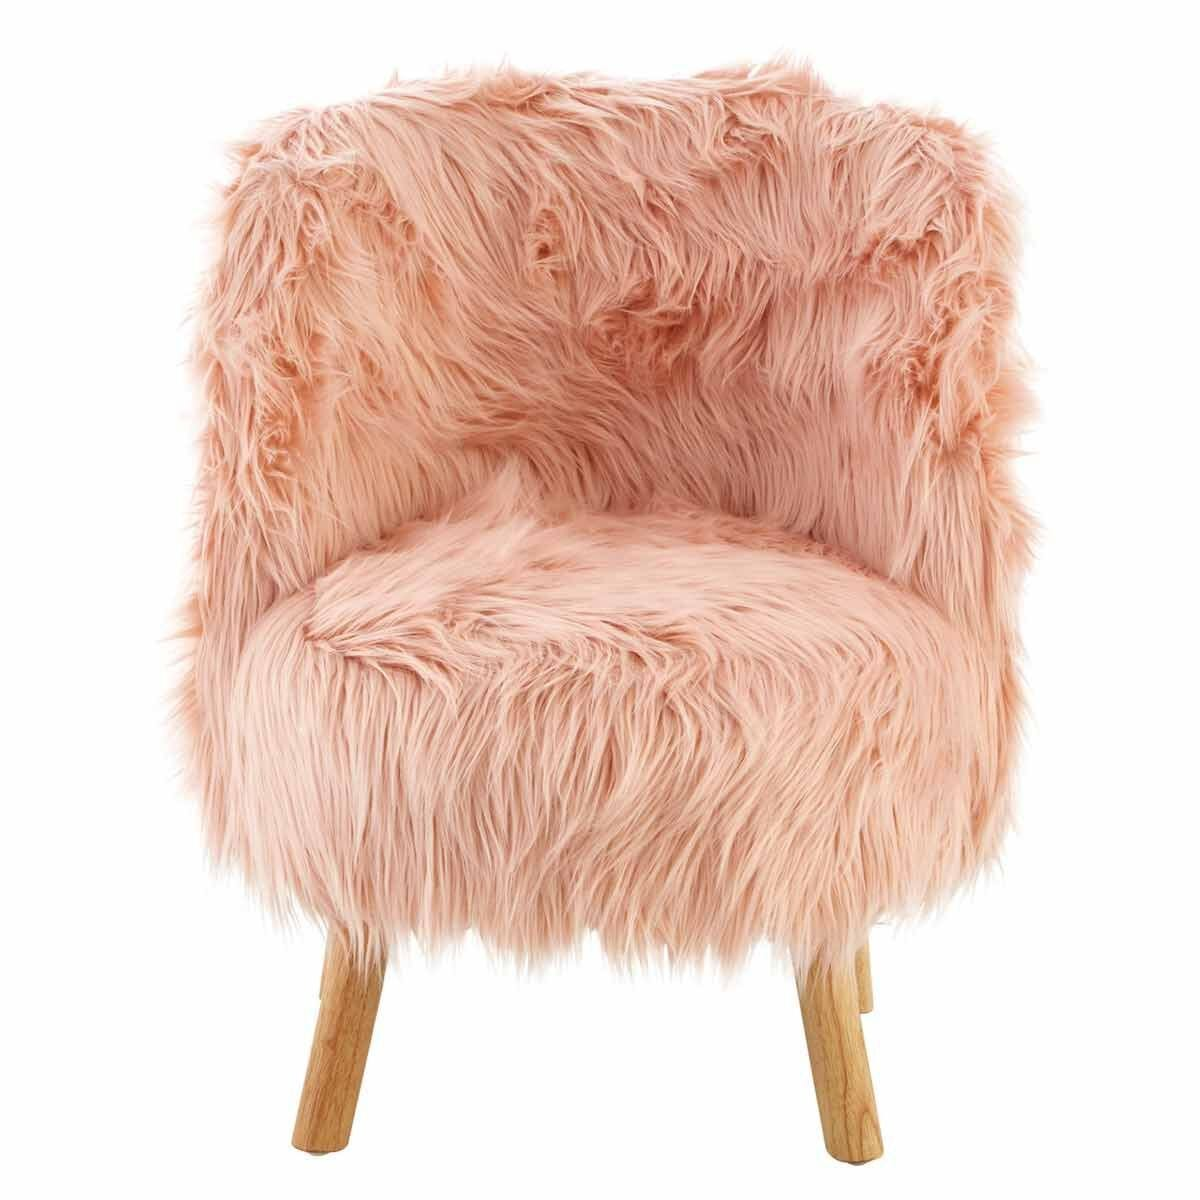 Premier Kids Faux Fur Chair